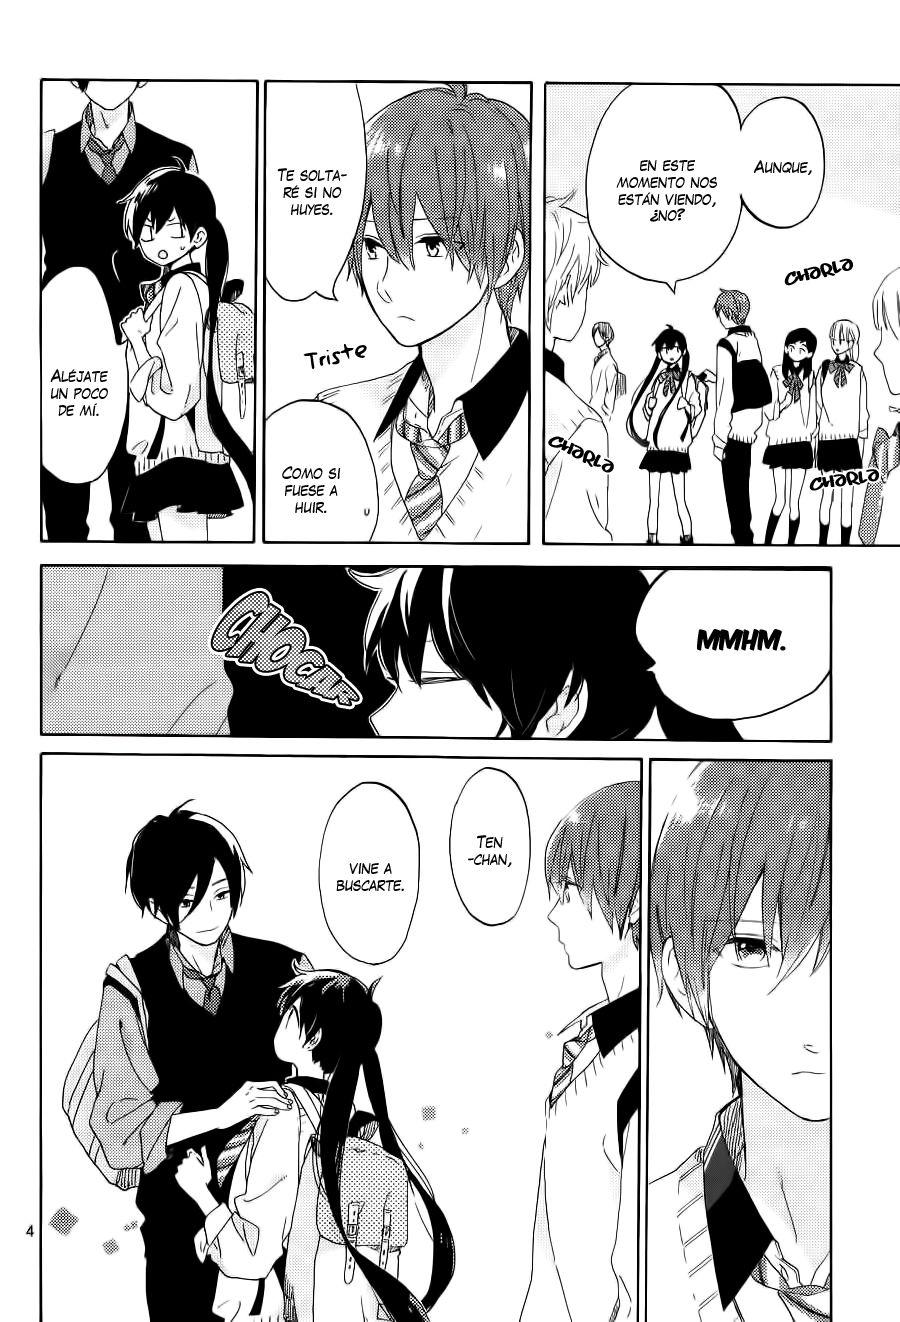 http://c5.ninemanga.com/es_manga/19/18451/464558/f9bafdeff998e2711d3033b720bec495.jpg Page 5